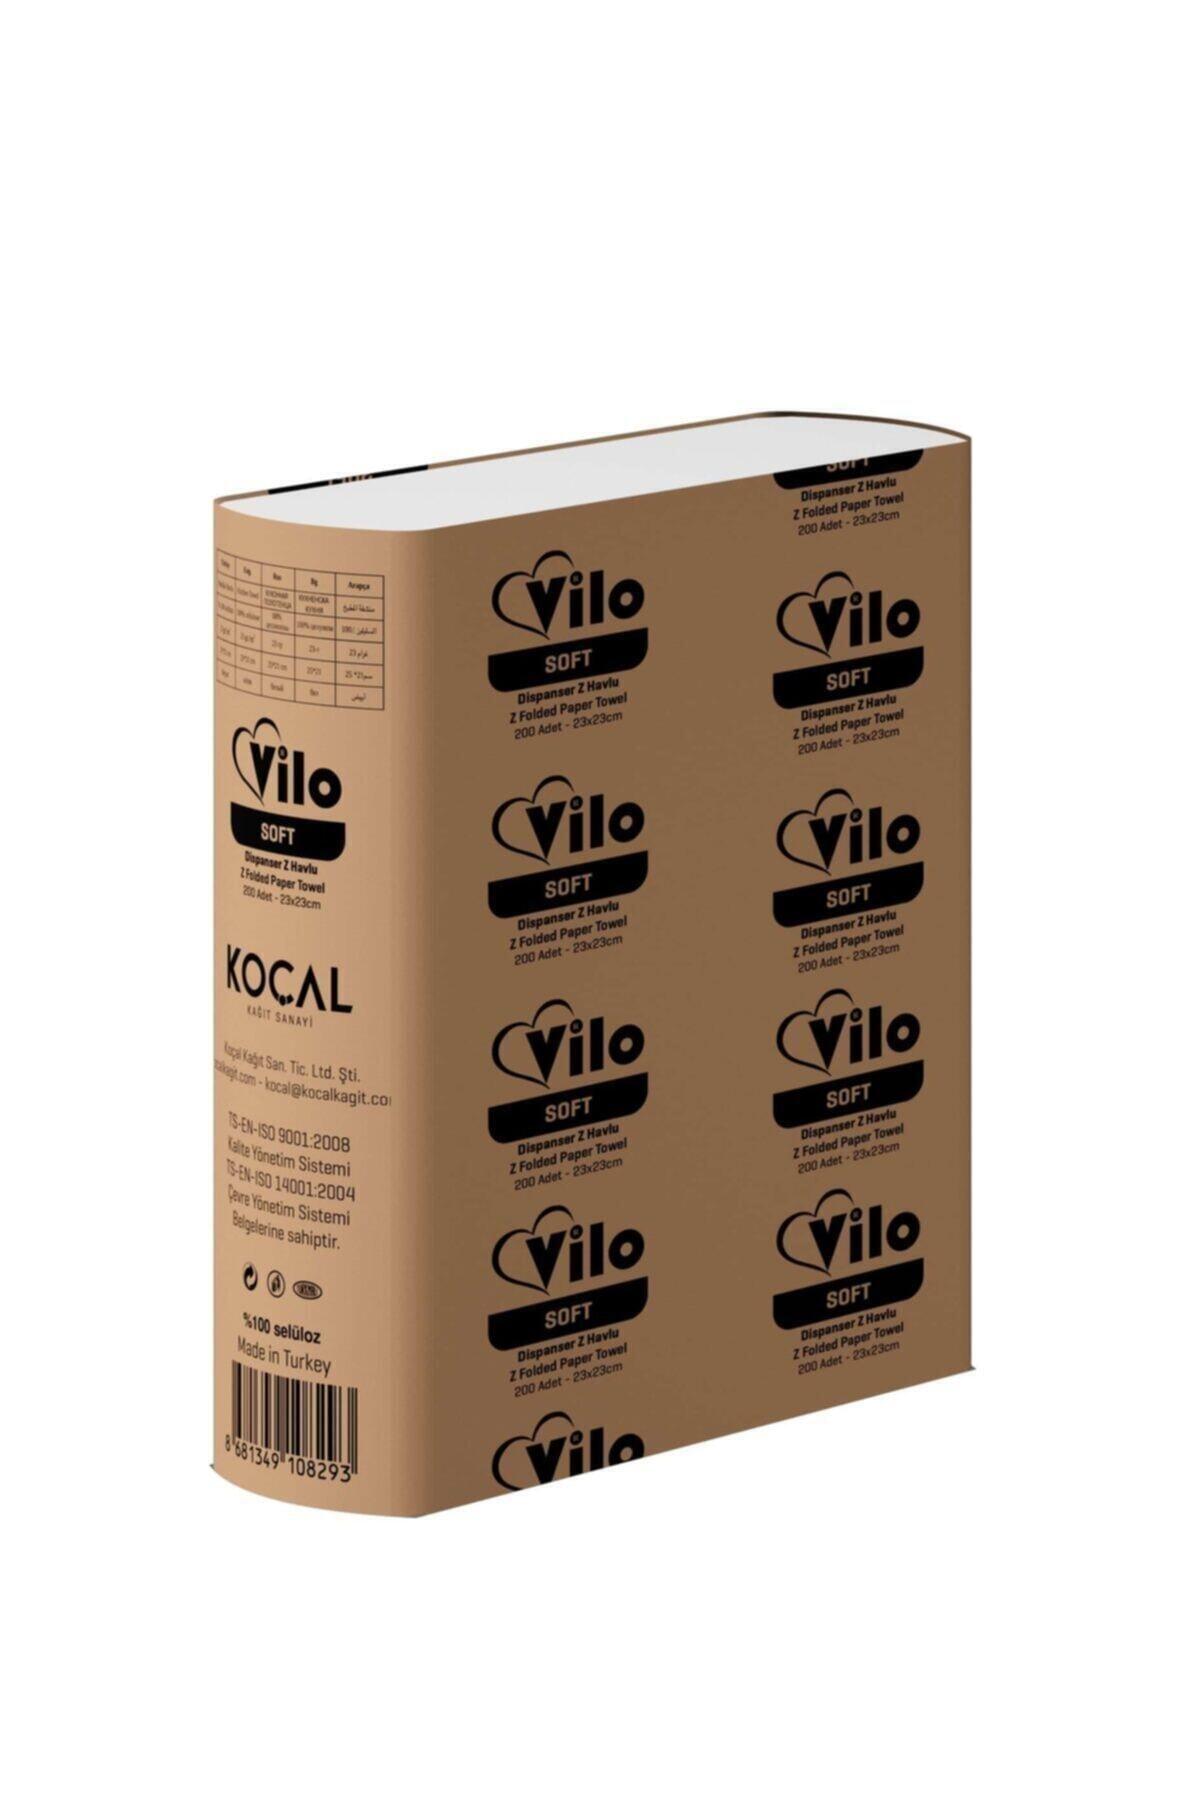 KOÇAL KAĞIT Vilo Soft Dispenser Z Katlama El Havlusu 200'lüx6 Paket ( 1200 Adet ) 1